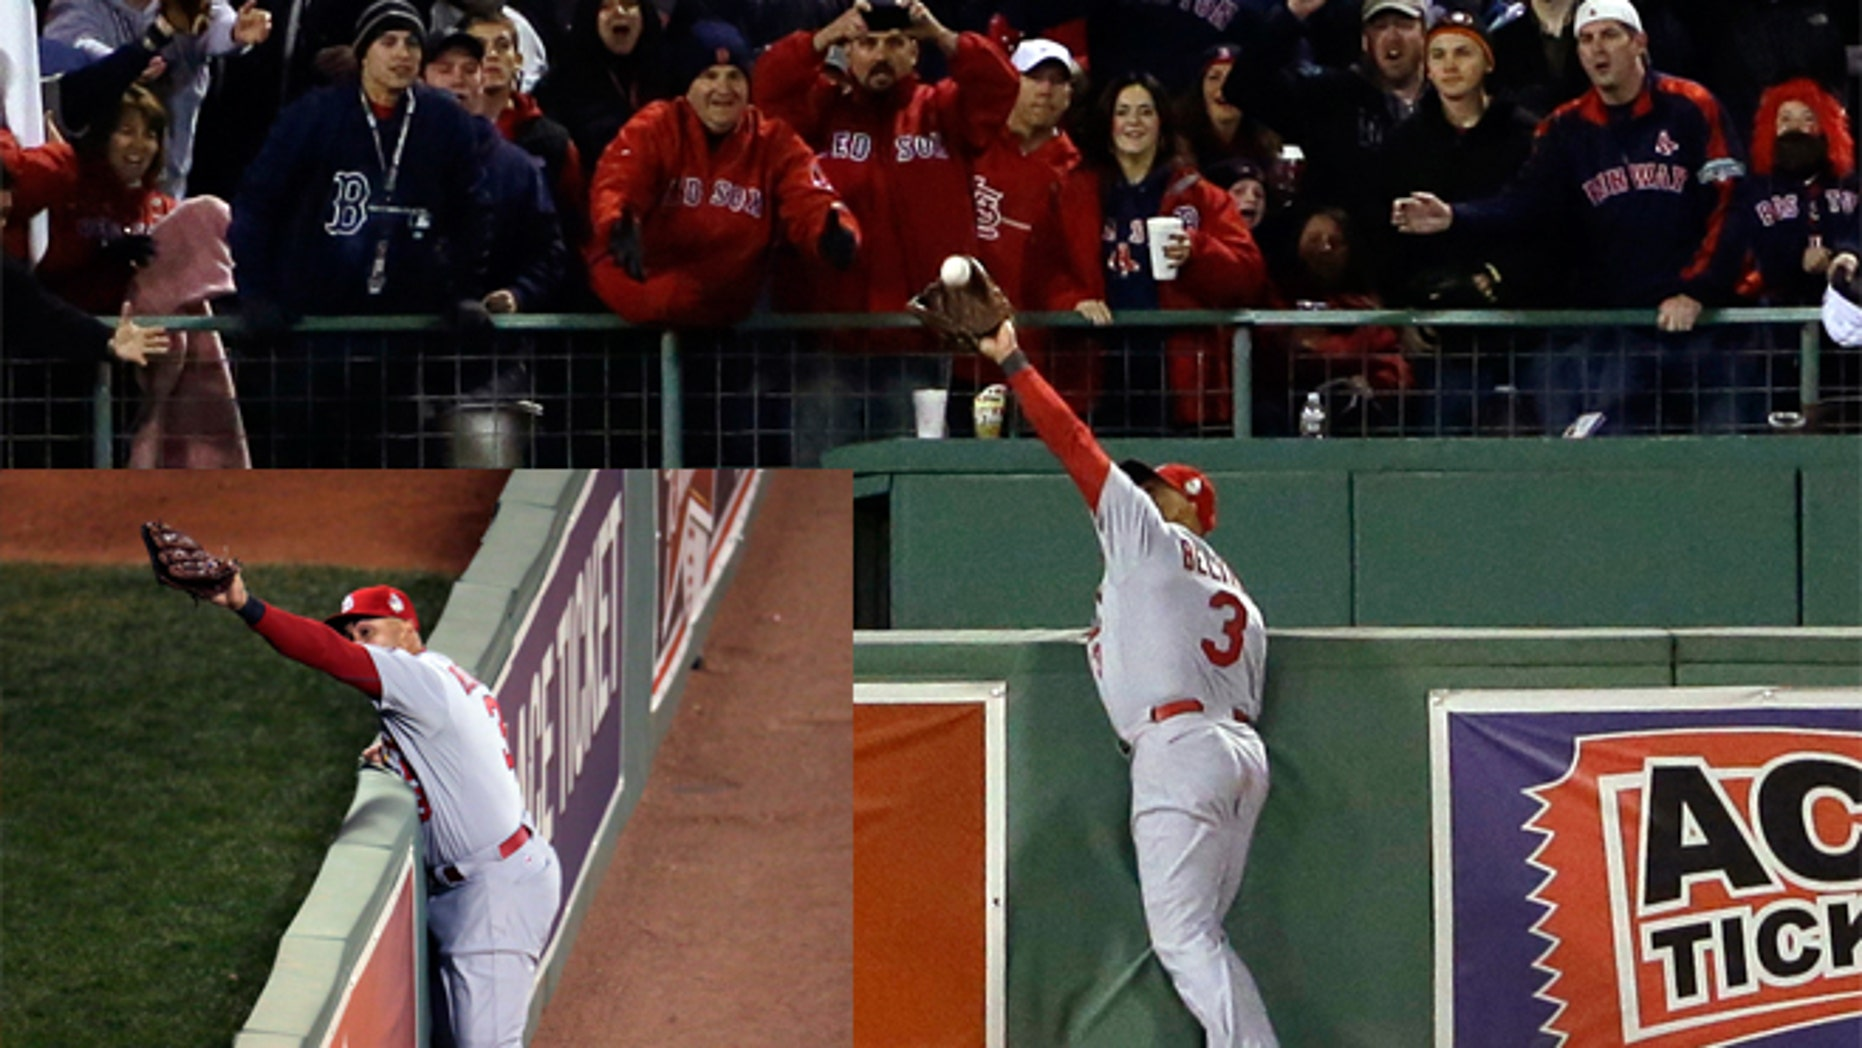 World Series Cardinals Carlos Beltran Injured After